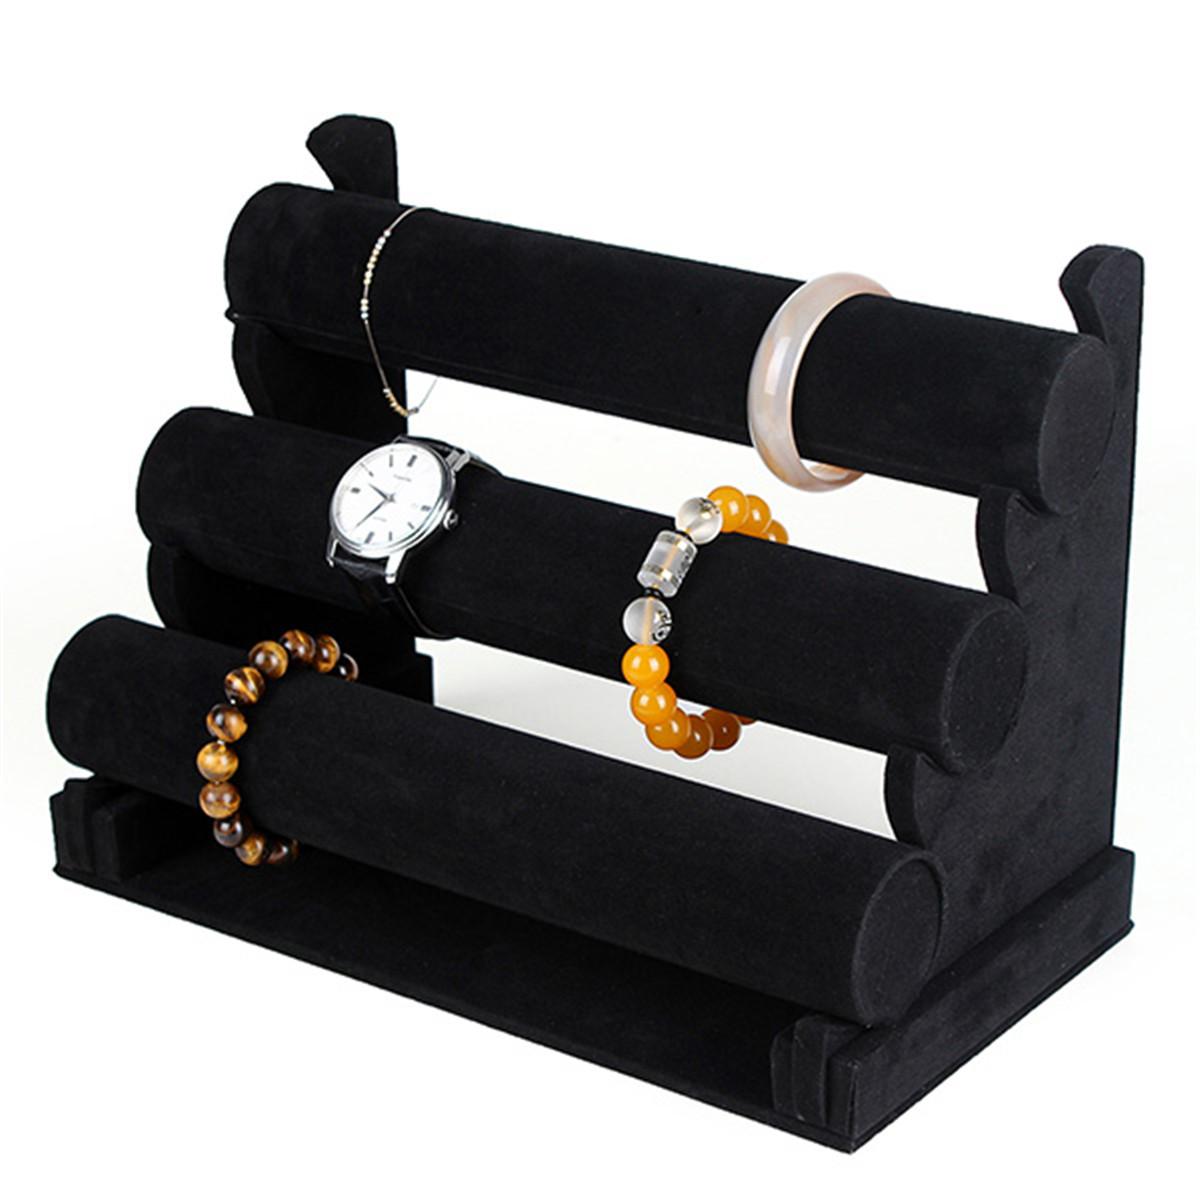 2016 Black Velvet 3 Tier Bangle Bracelet Chain Watch Jewellery Display Stand Tray Assembled Organizer Hard Case Holder(China (Mainland))